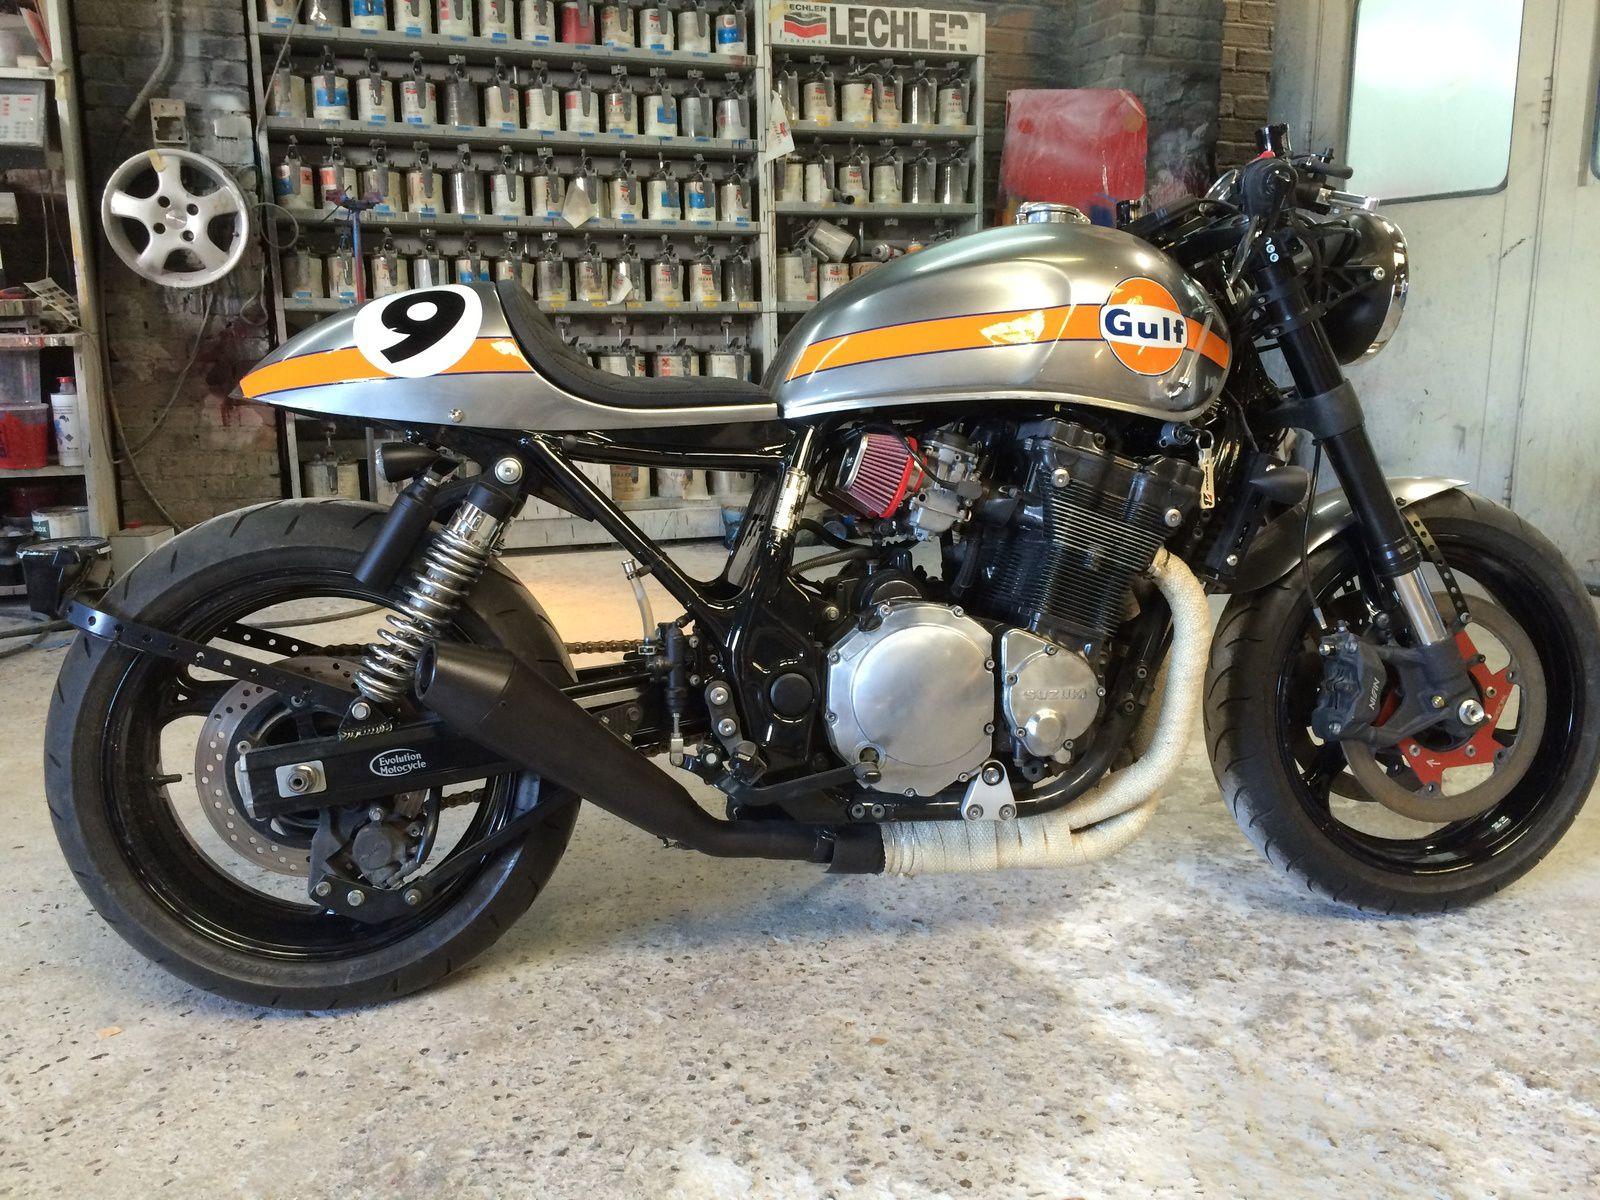 Bien connu suzuki inazuma cafe racer - Evolution Motocycle IY58